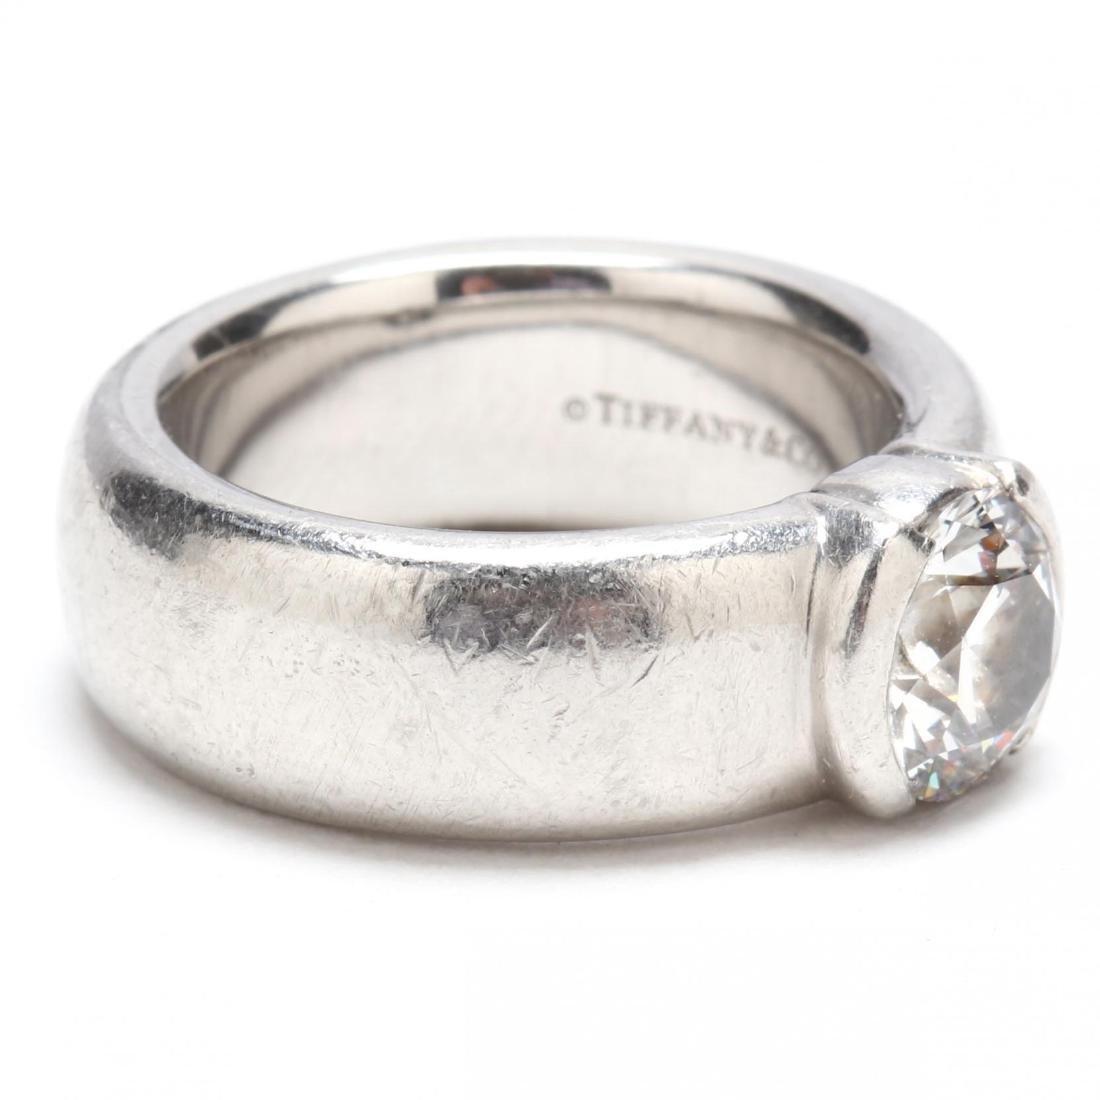 Platinum and Diamond Ring, Tiffany & Co. - 2